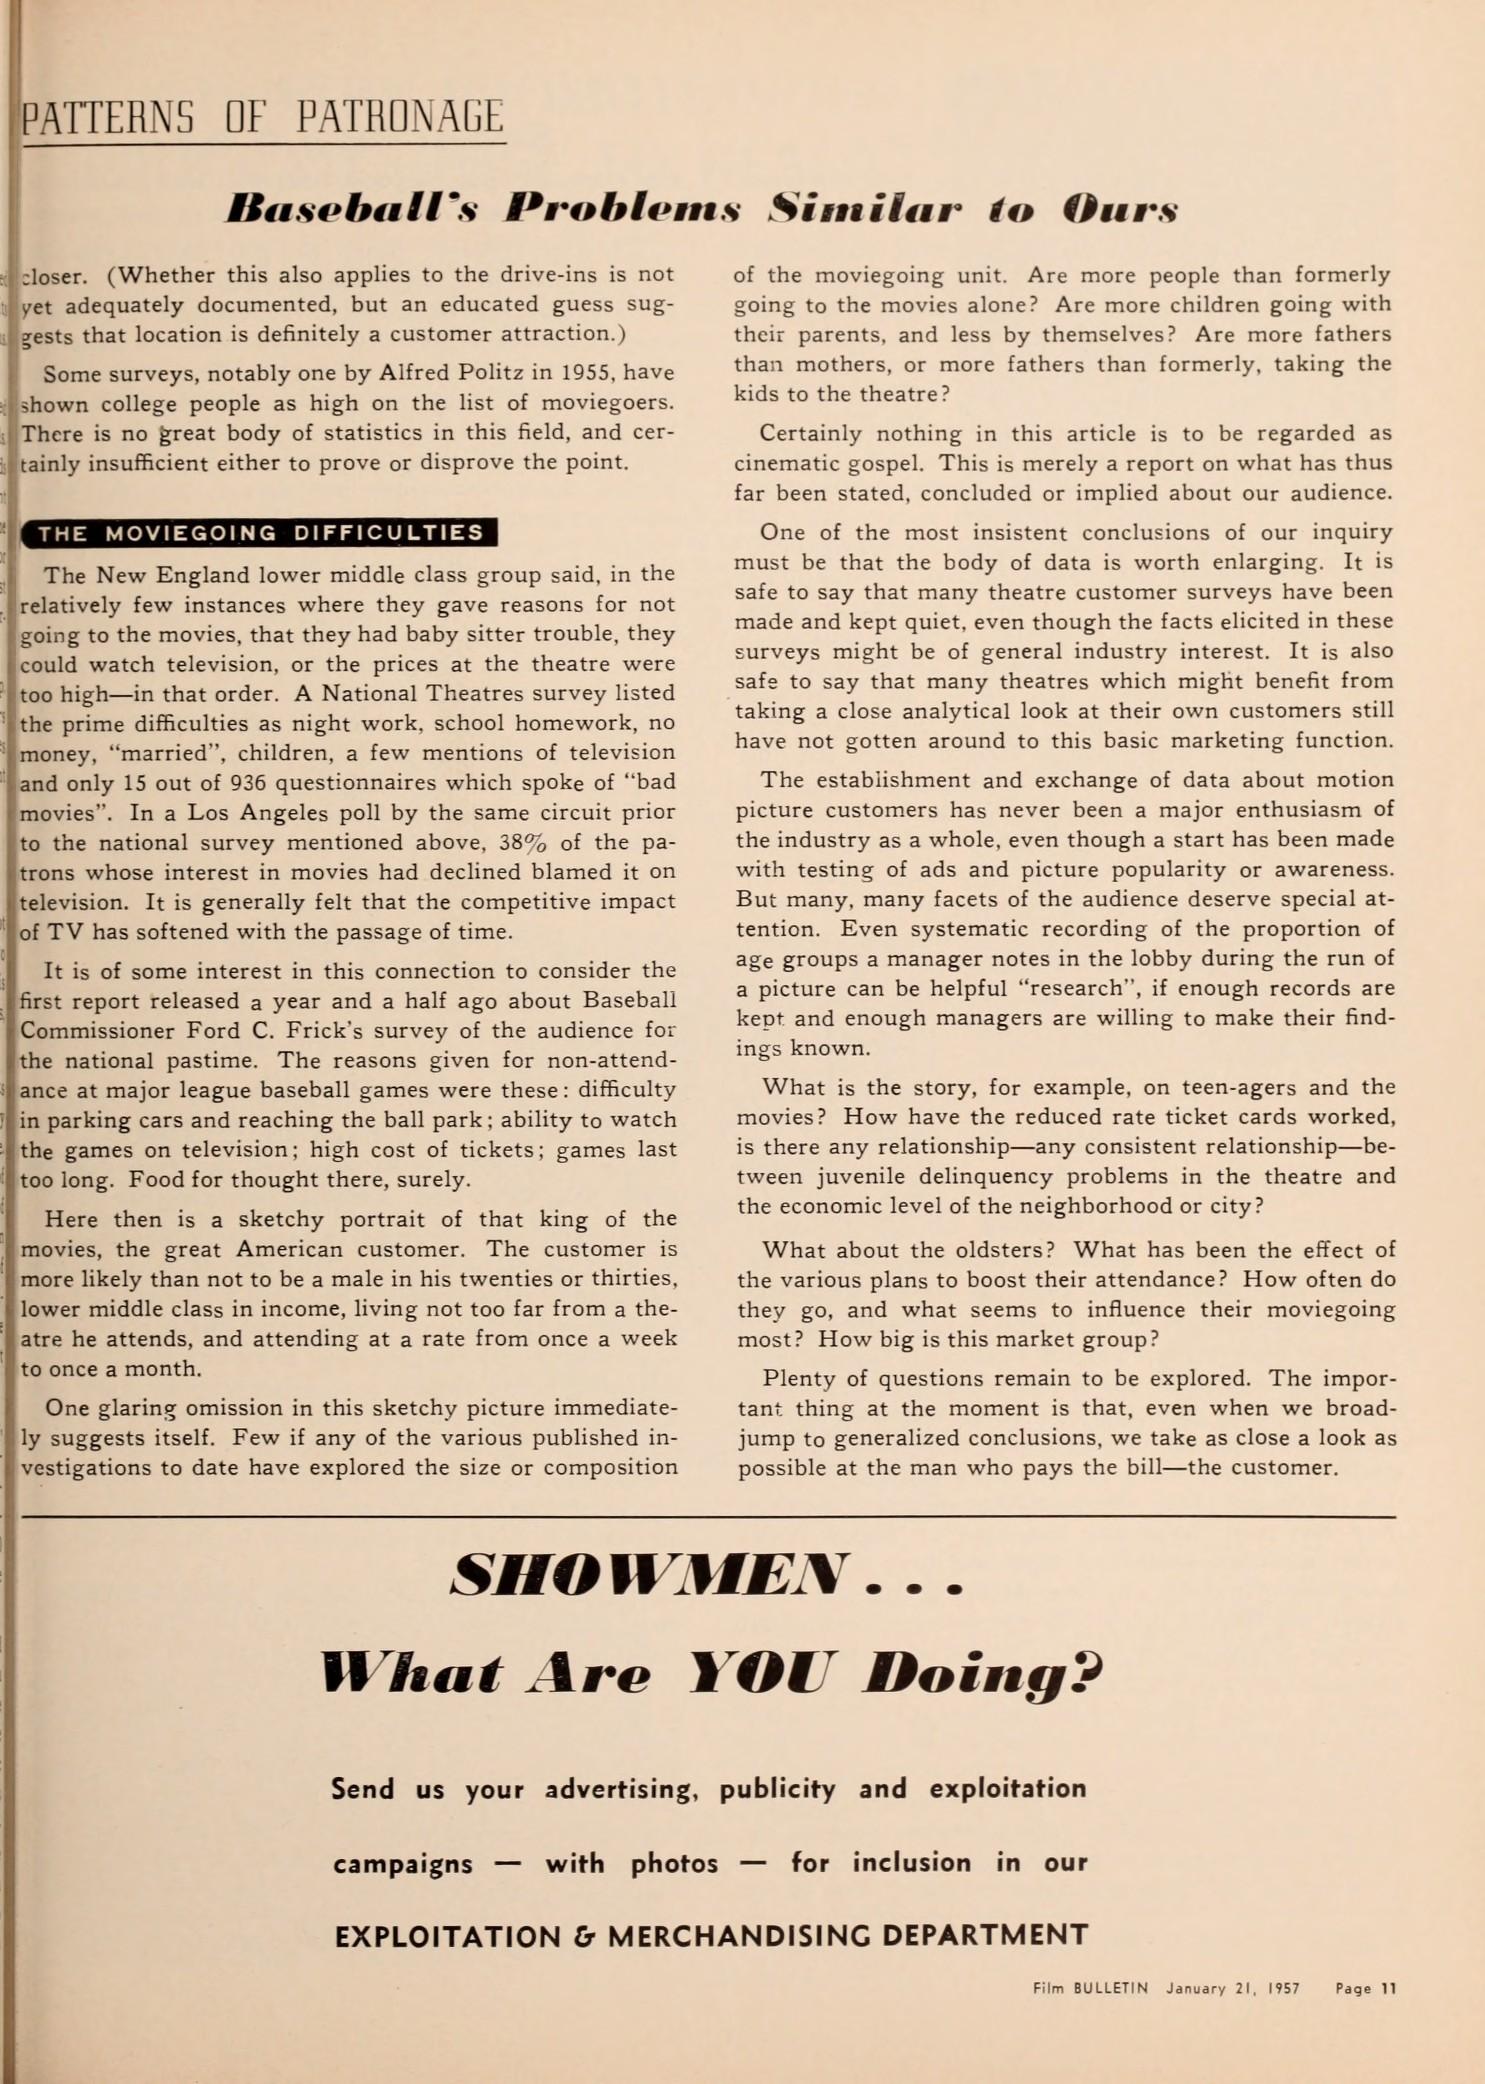 Filmbulletin195725film_jp2.zip&file=filmbulletin195725film_jp2%2ffilmbulletin195725film_0041